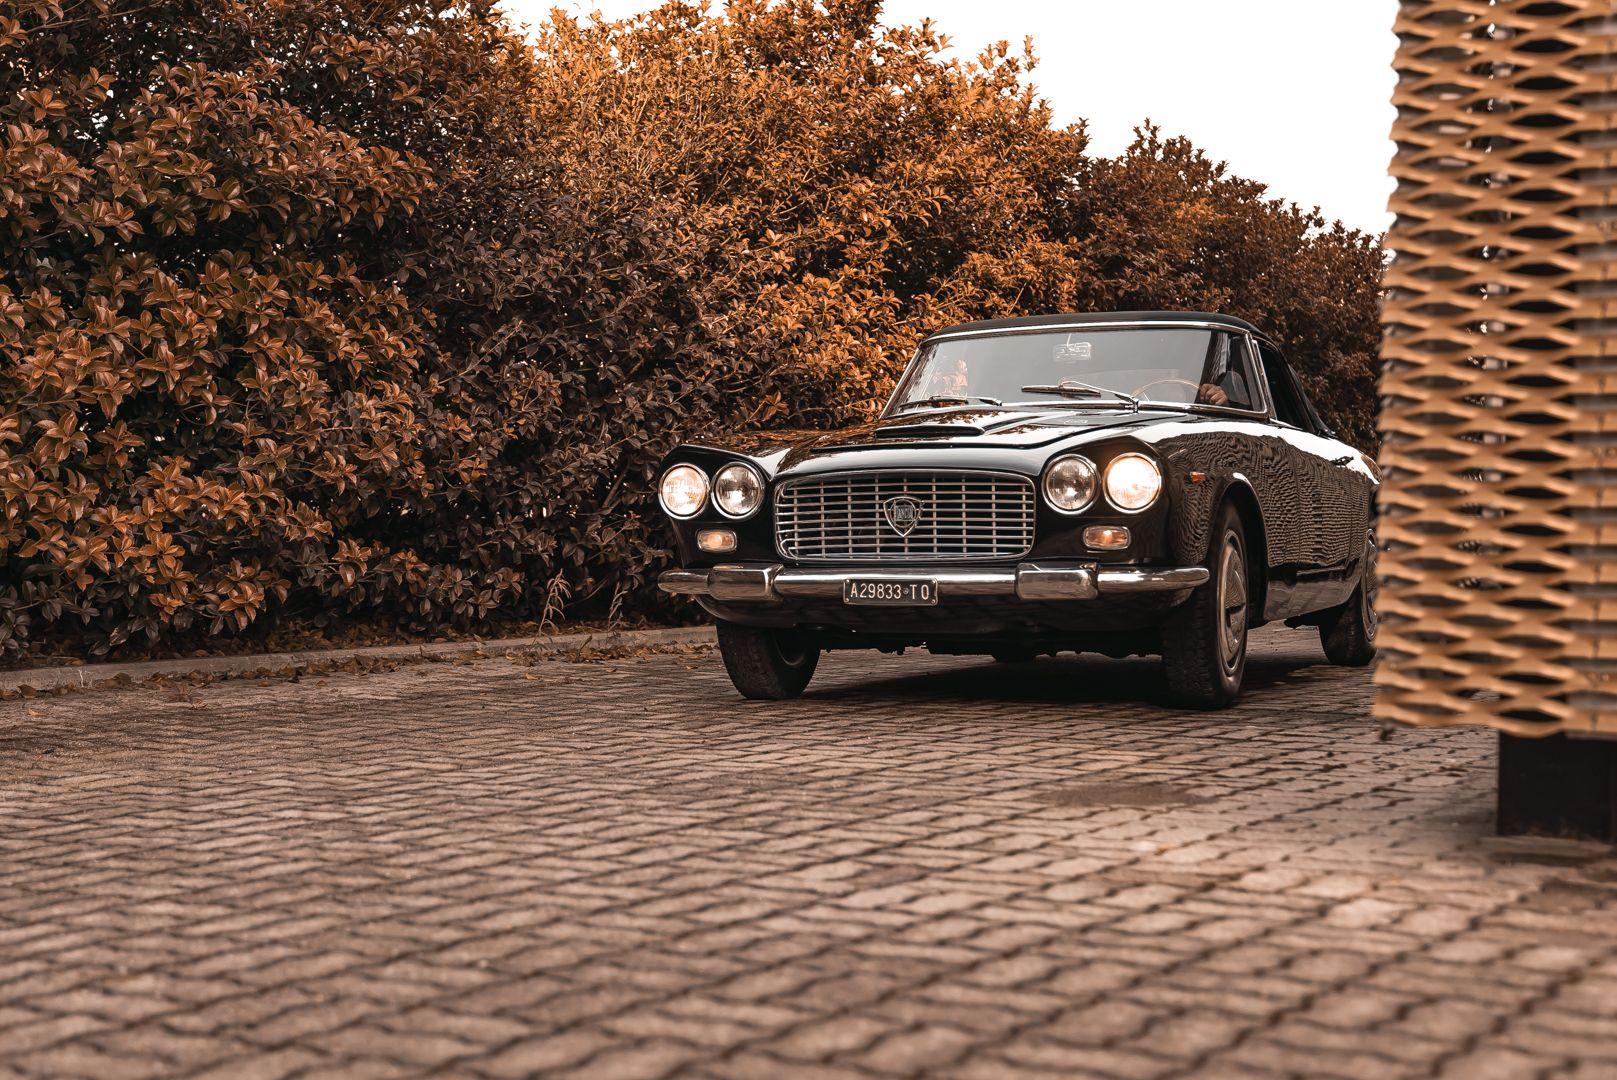 1968 Lancia Flaminia Touring Convertible 2800 3C 79169